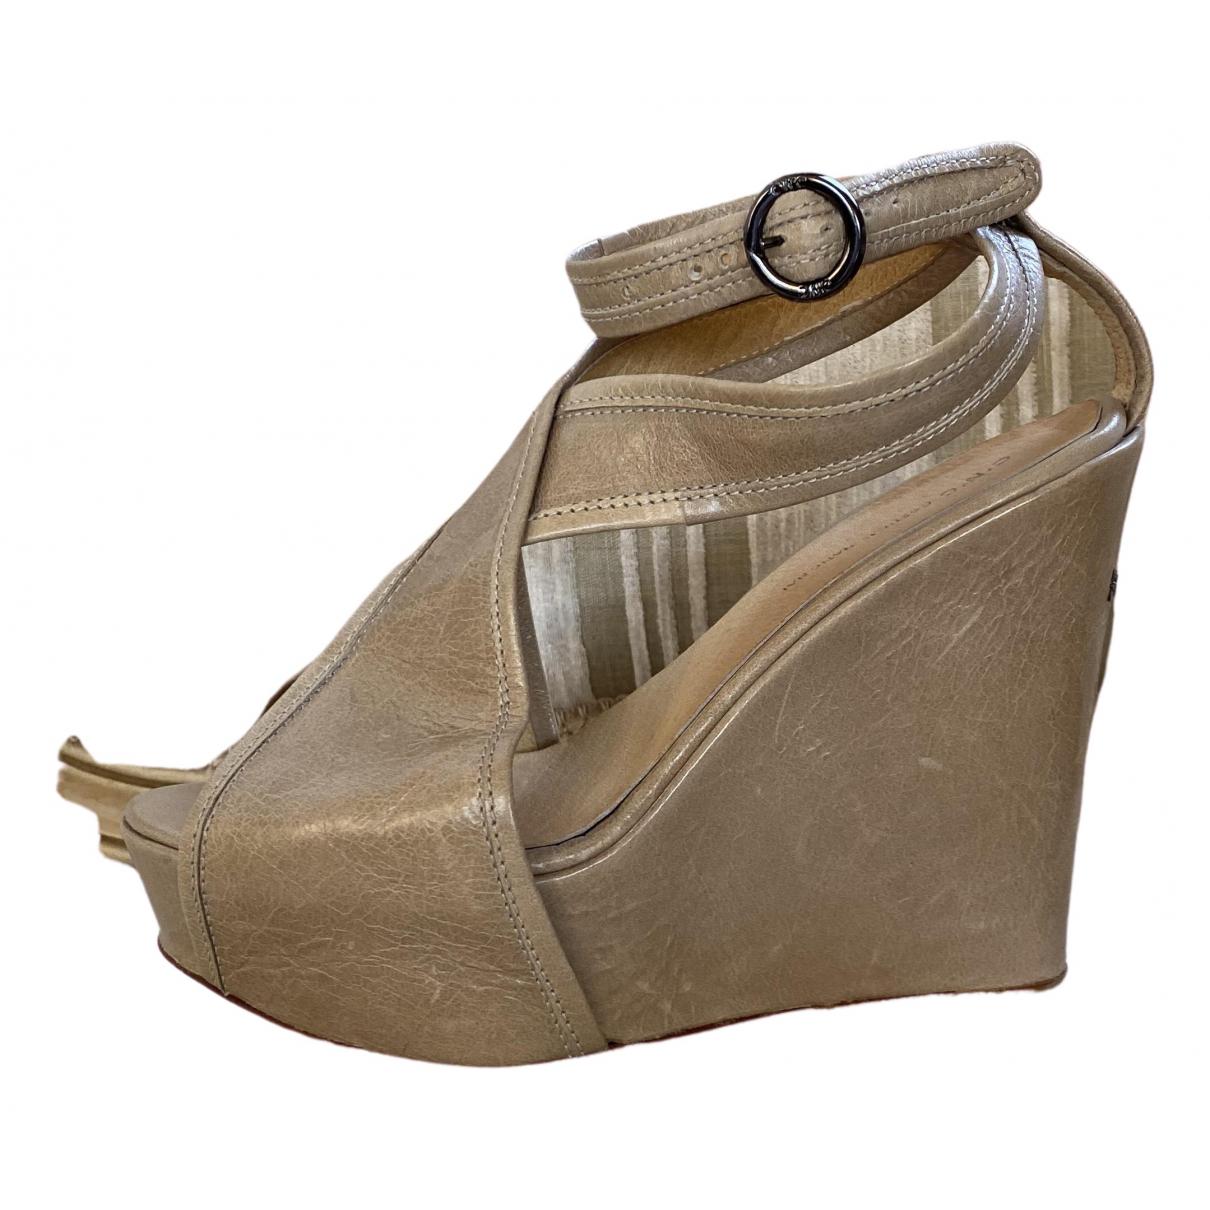 Cnc \N Beige Leather Mules & Clogs for Women 38 EU